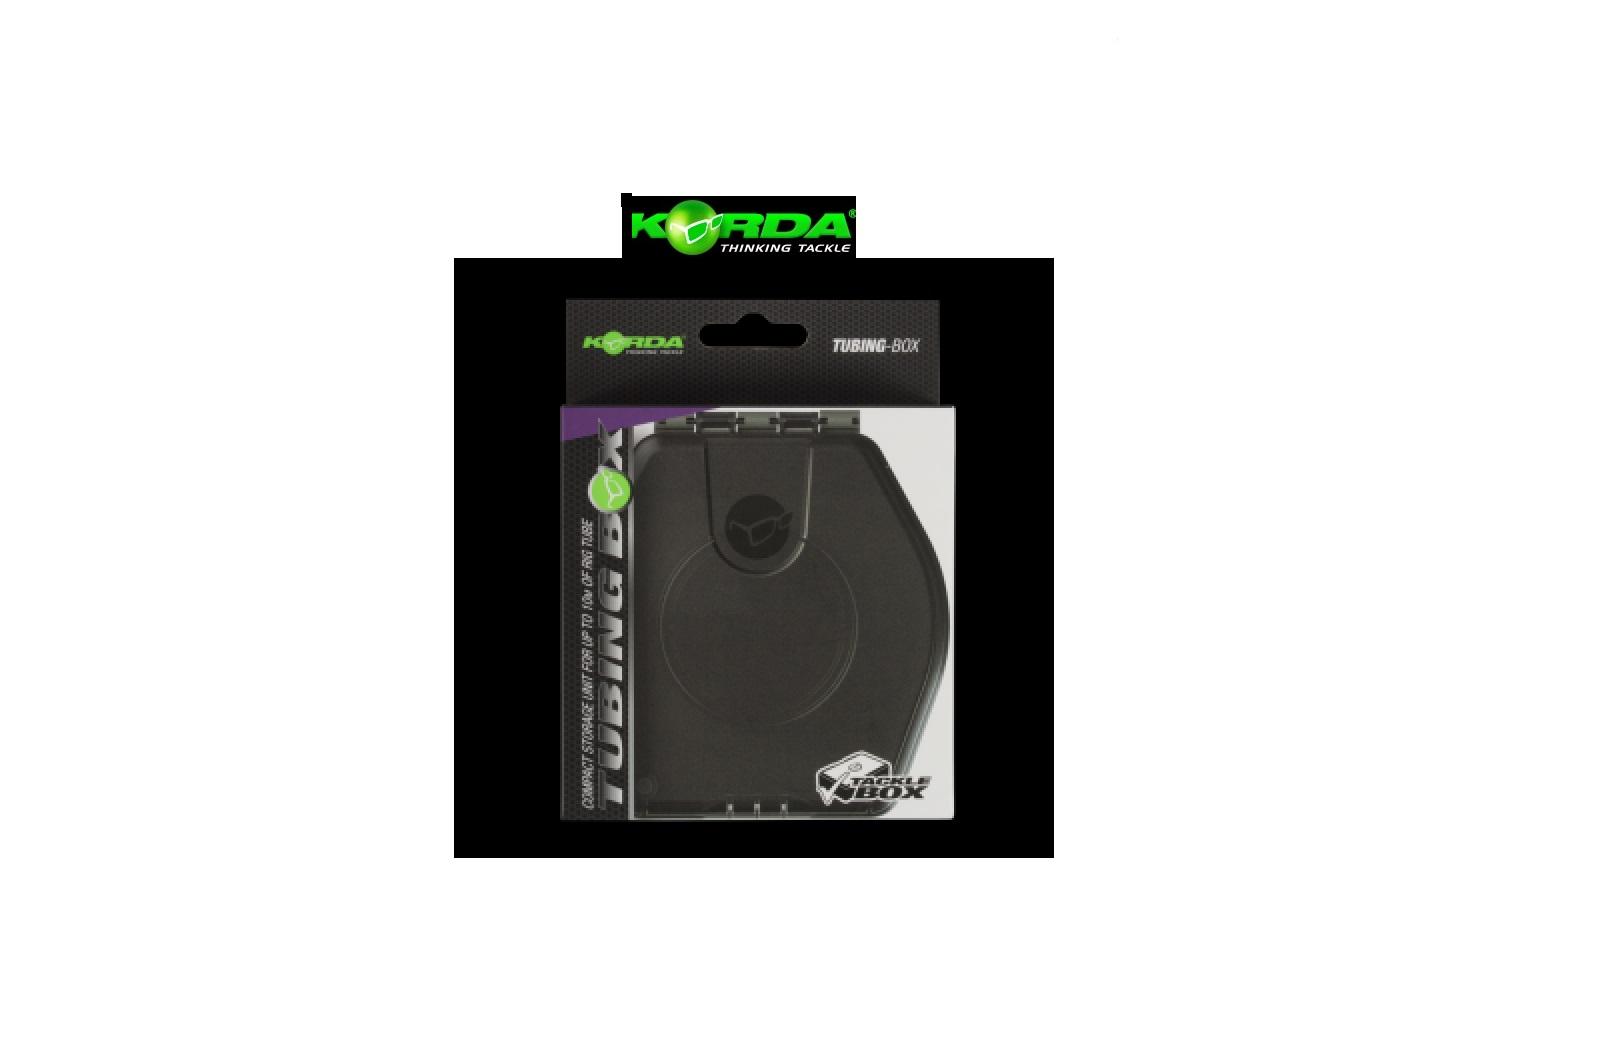 Compac Tubing Box Korda cod KBOX13